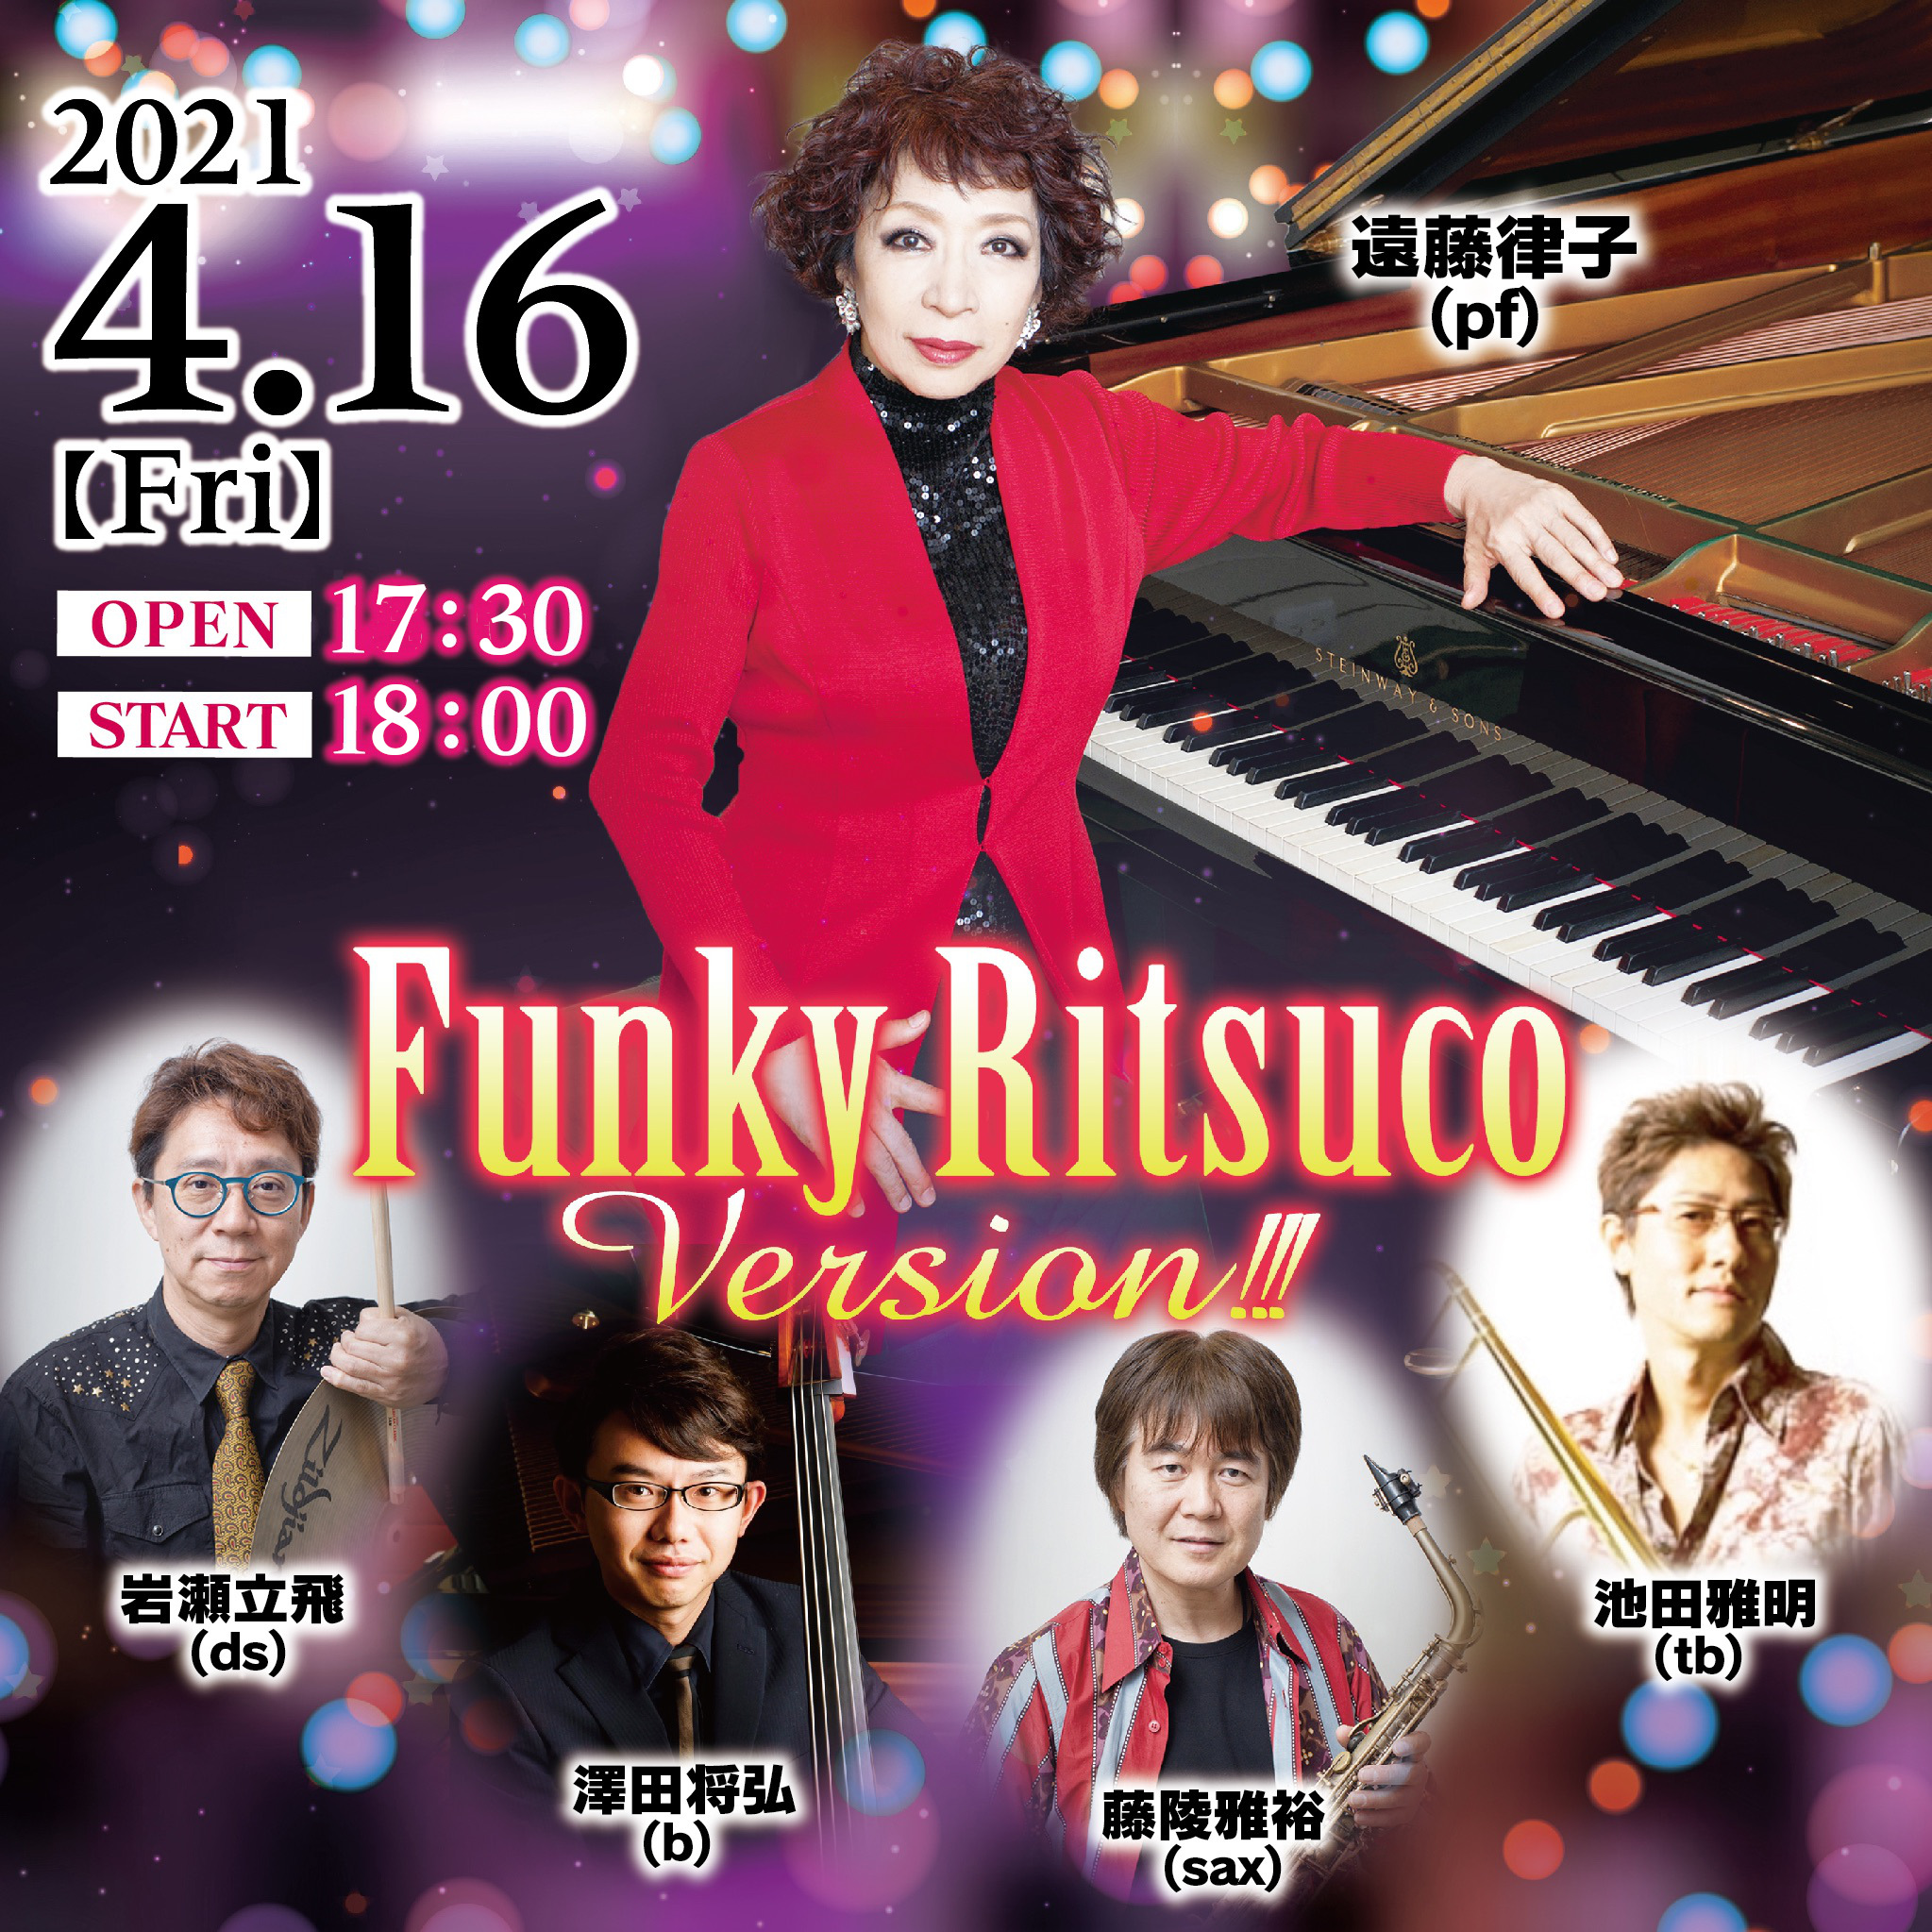 遠藤律子 Funky Ritsuco Version!!